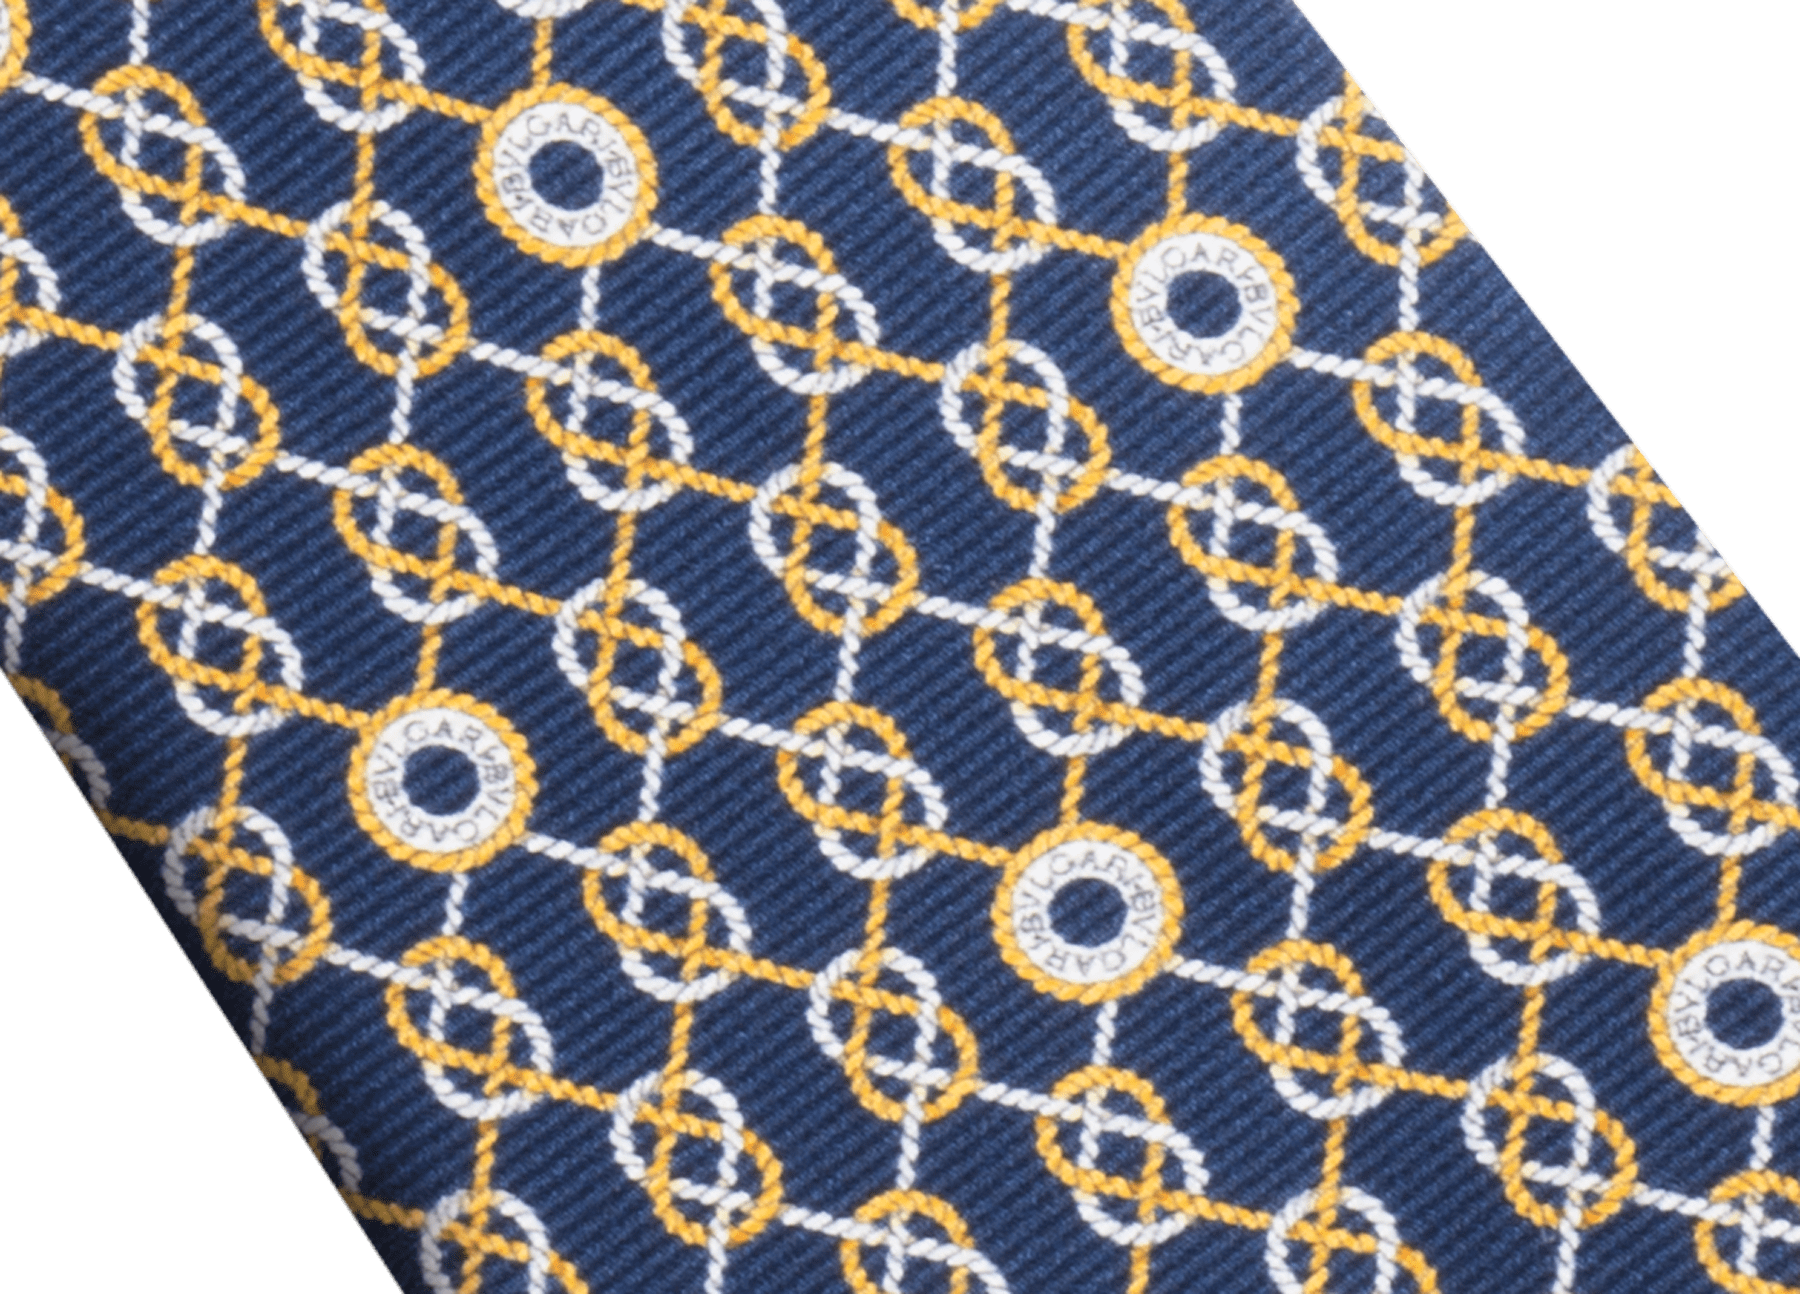 Navy Sailor Logo pattern seven-fold tie in fine saglione printed silk. 244199 image 2